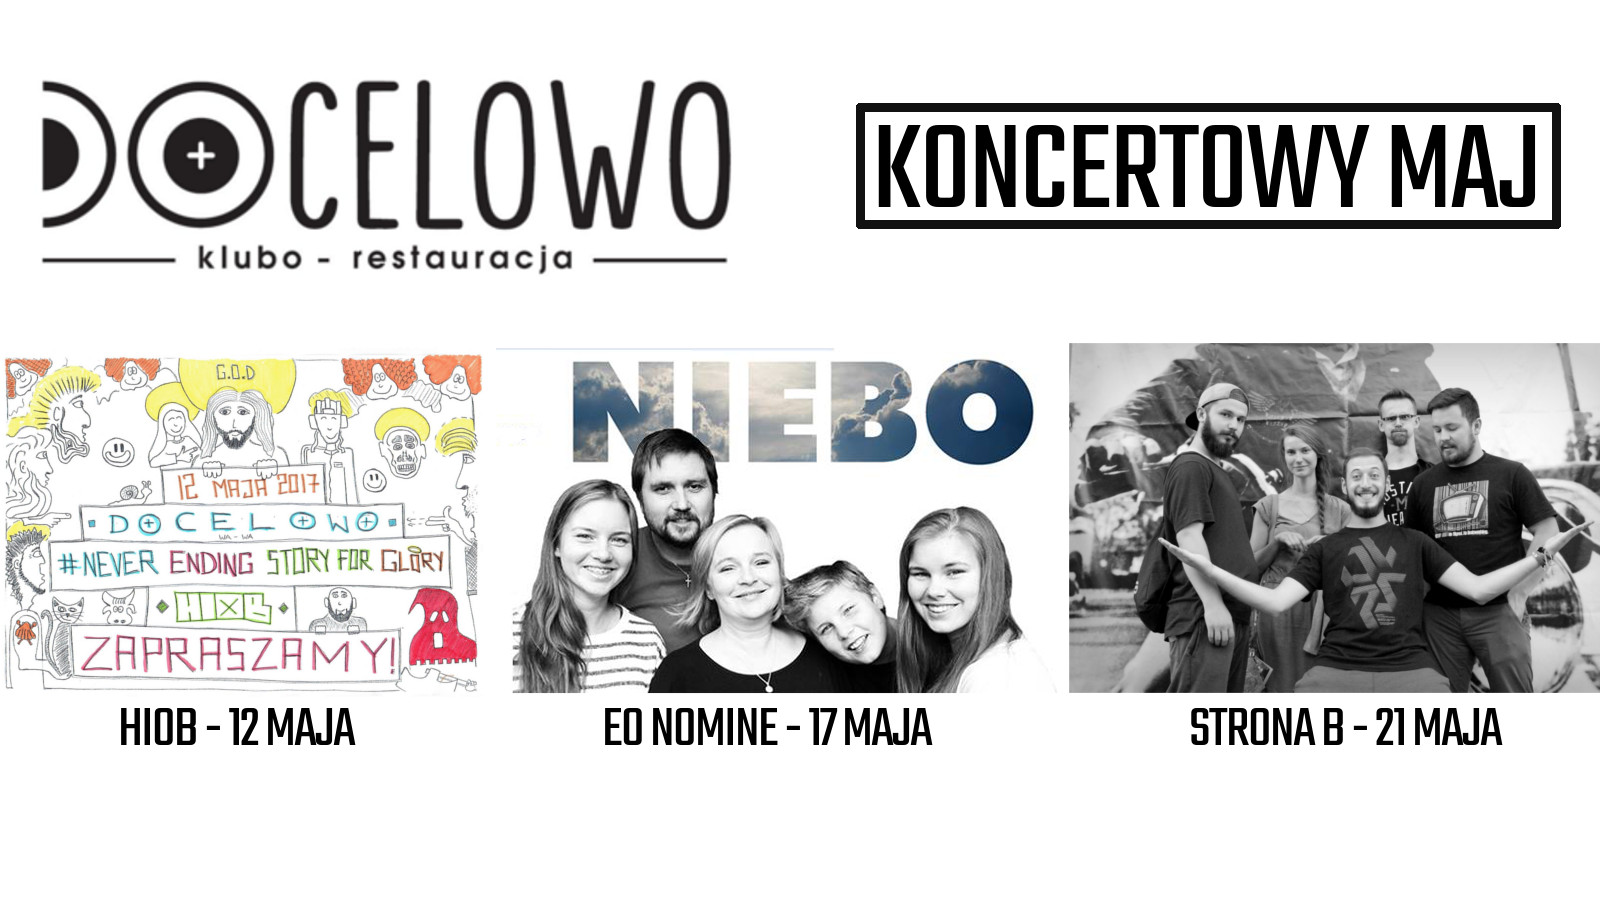 Docelowo - koncertowy maj / StronaB, Eo Nomine, Hiob